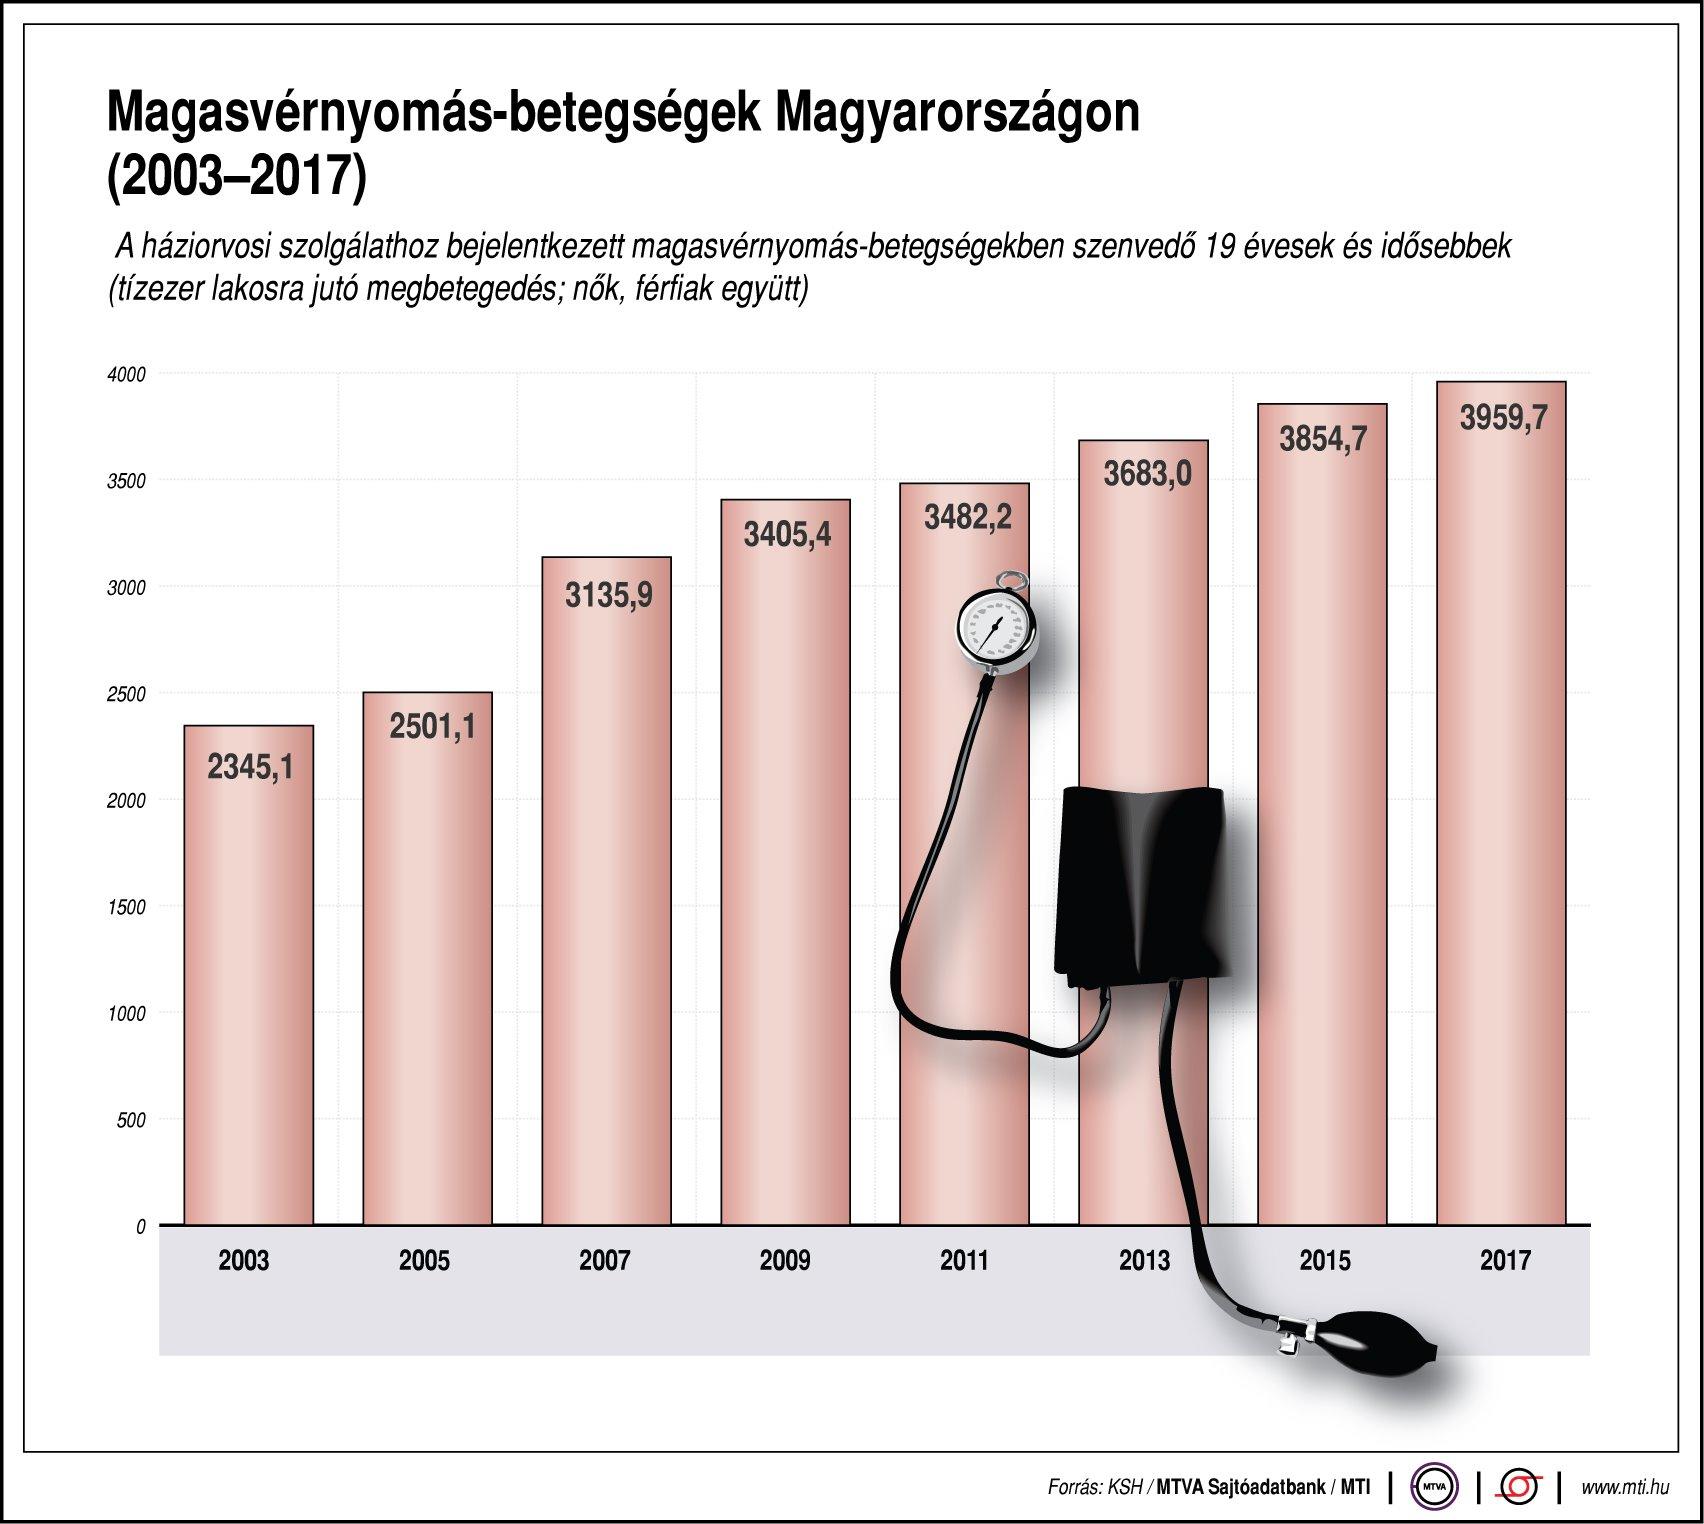 spray-k magas vérnyomás ellen magas vérnyomás és douche